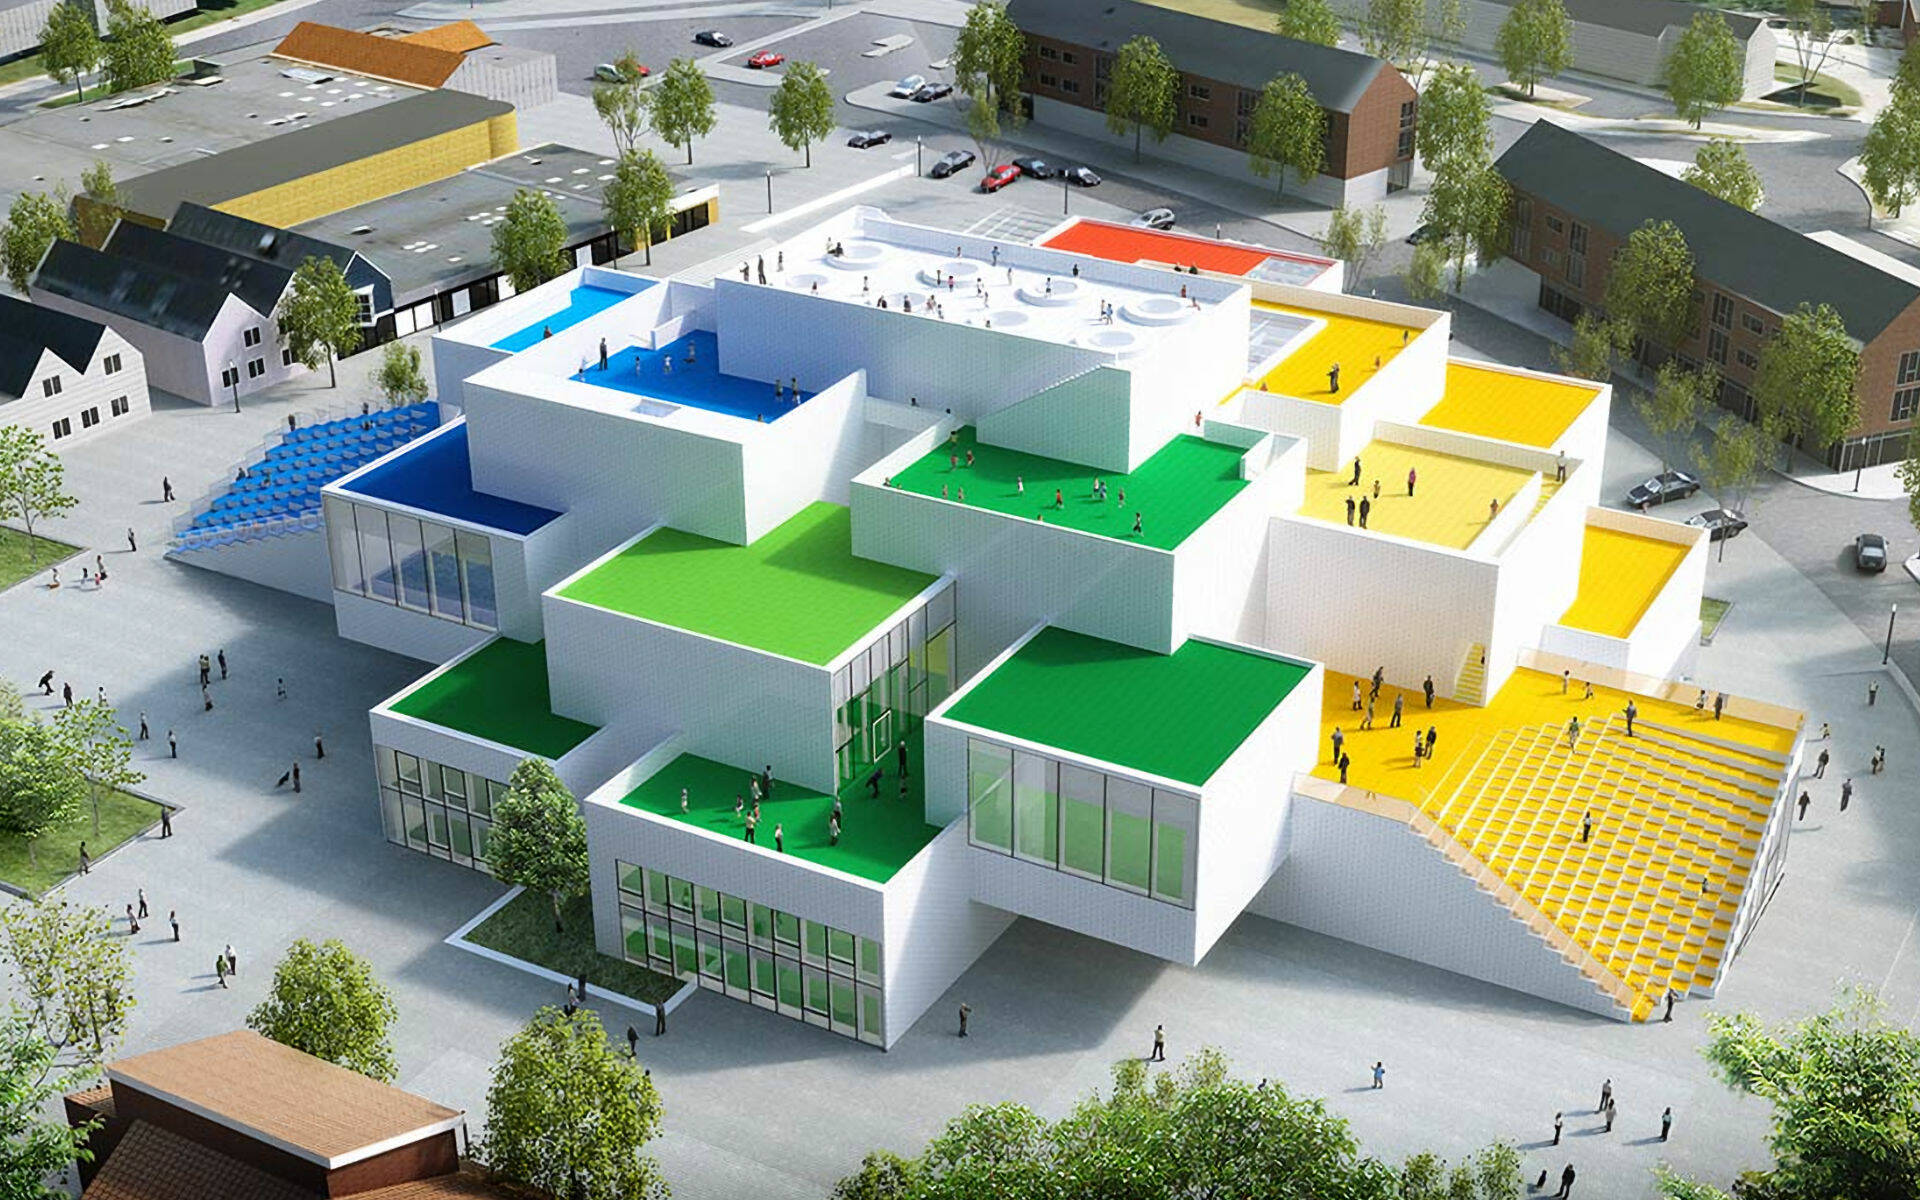 LEGO MANIA - LEGO HOUSE